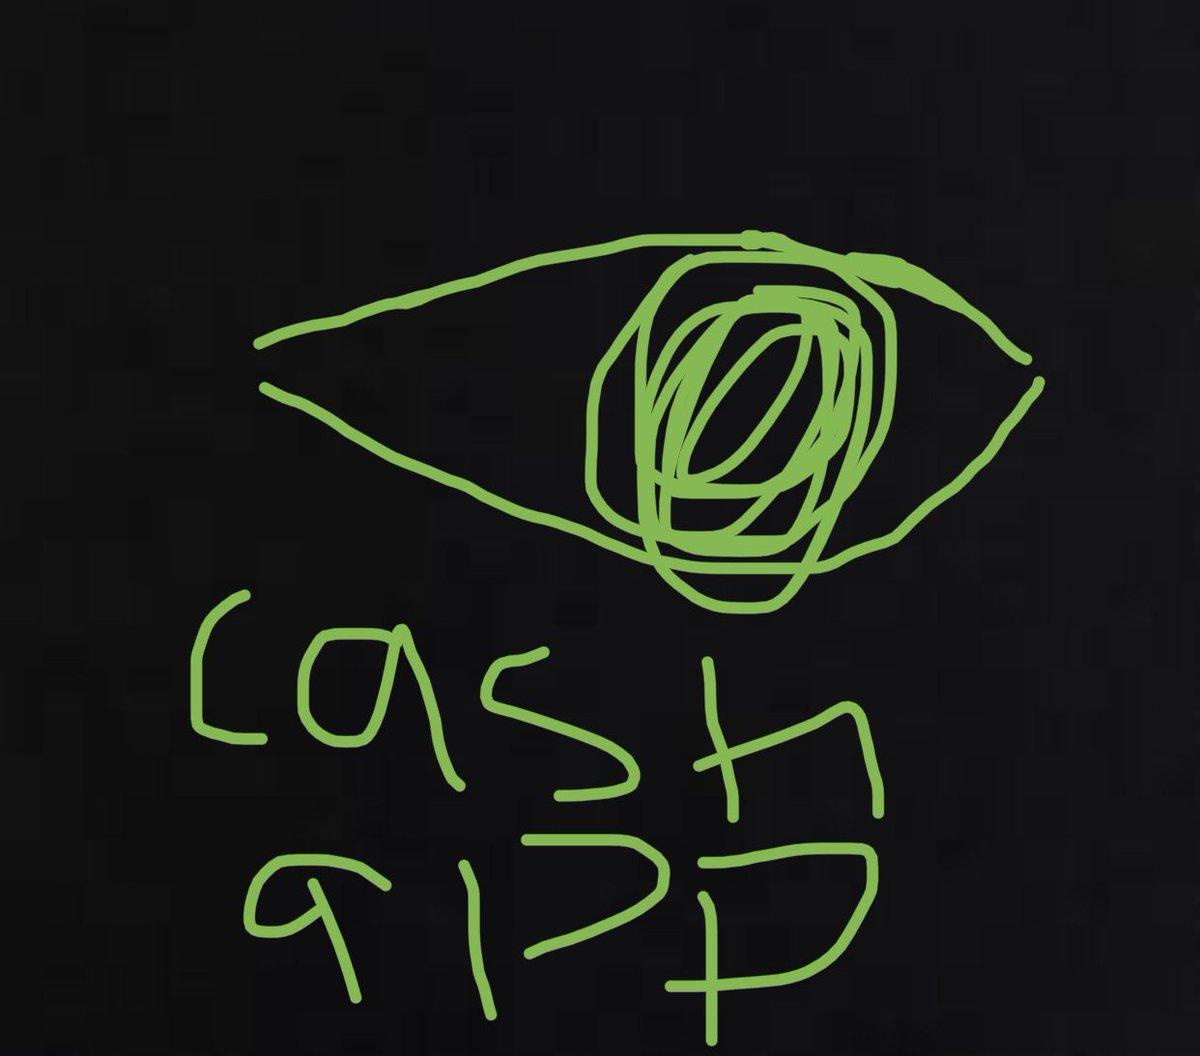 11/15 😭 #cashapptrivia @CashApp @AustinOnTwitter  I got #15 Correct!!!! That was the best moment 😊 $jassellehearts